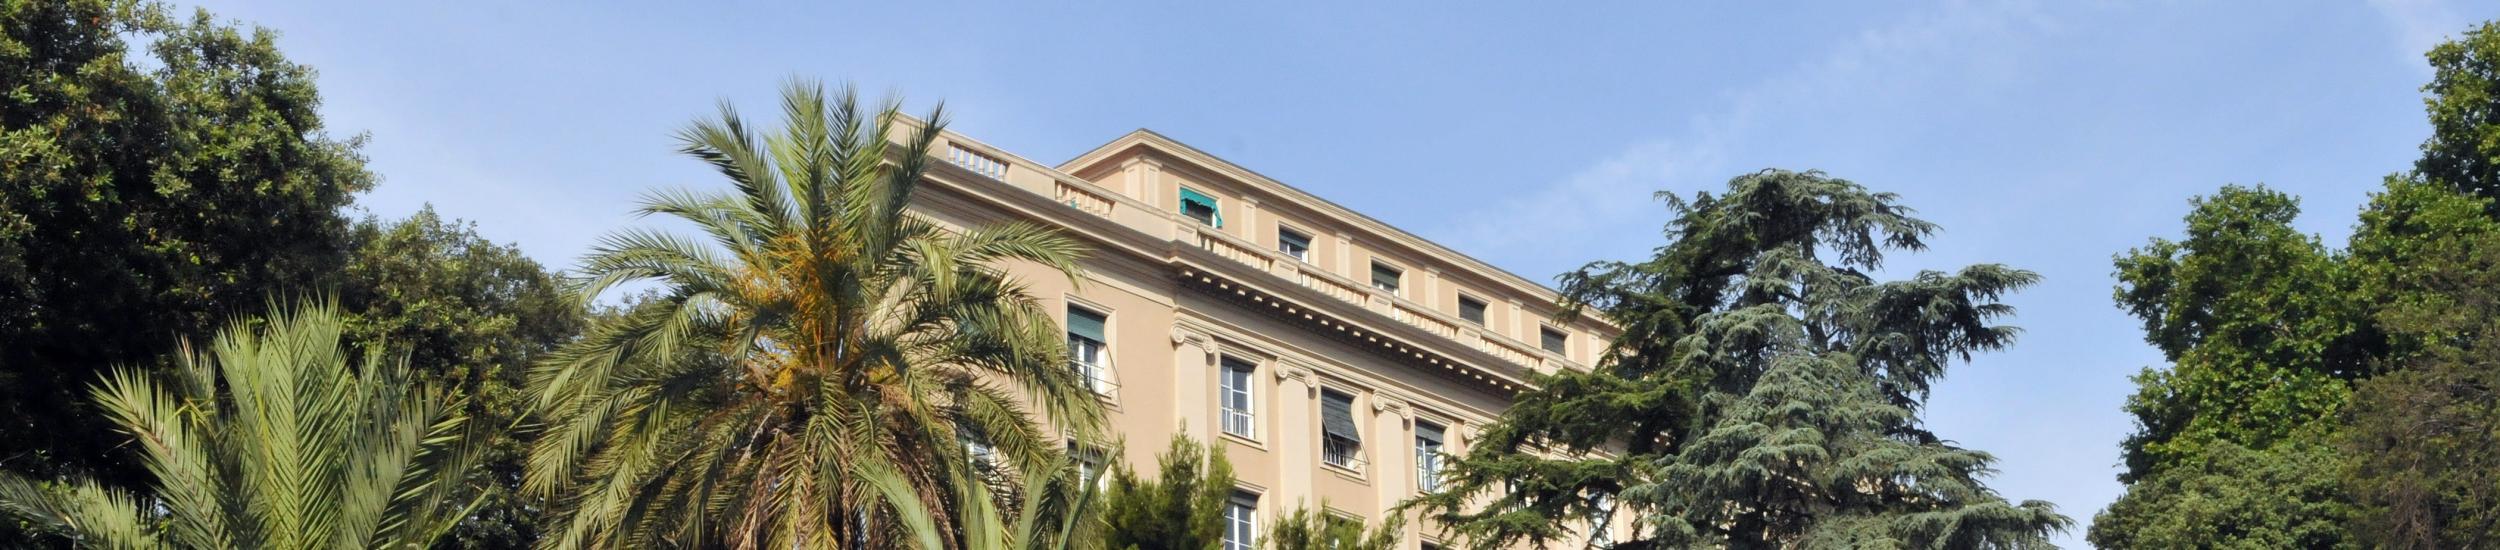 Palazzo di Città Metropolitana di Genova